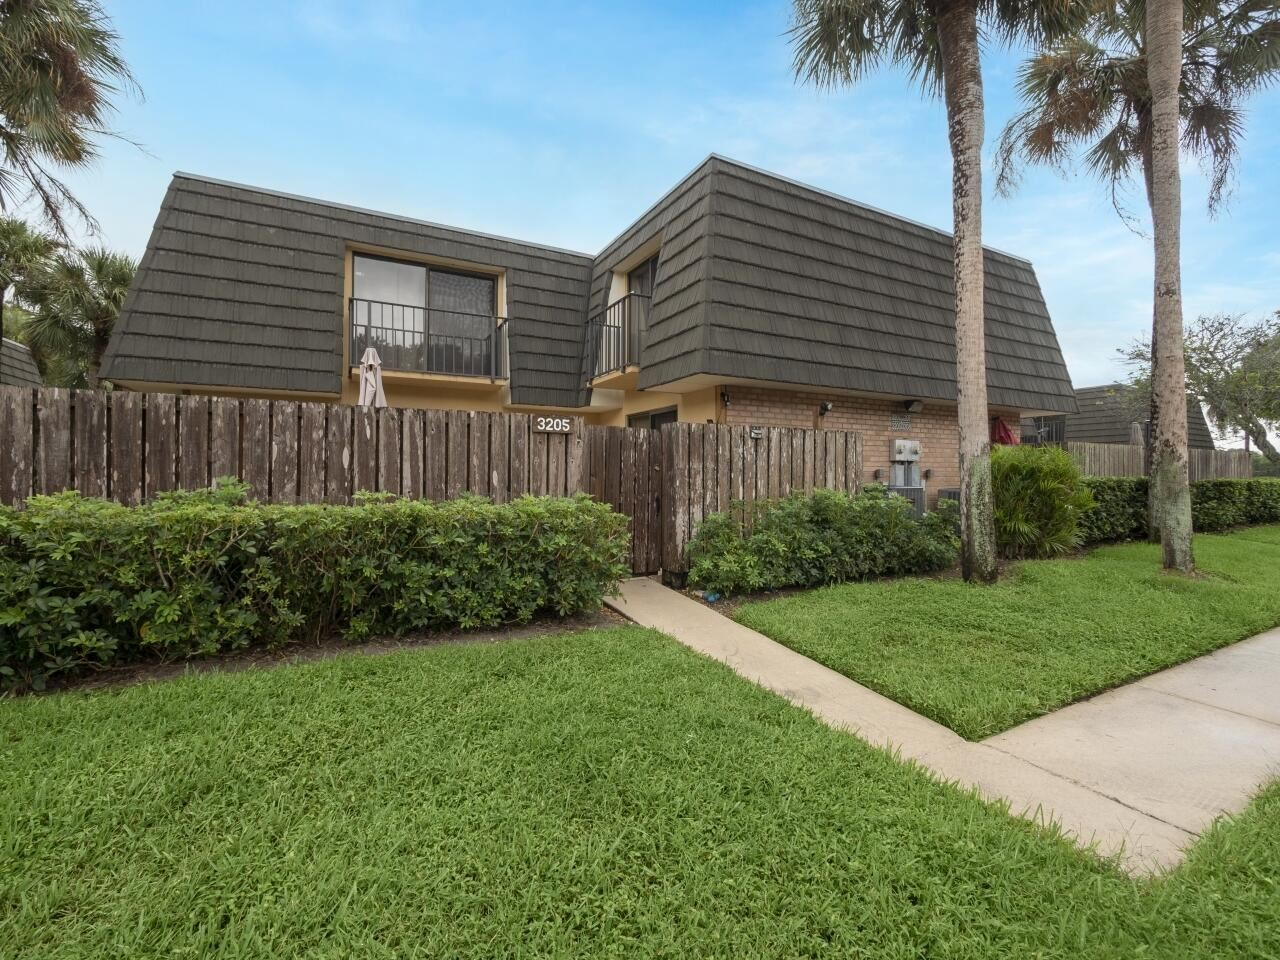 3205 32nd Way, West Palm Beach, FL 33407 - MLS#: RX-10753649